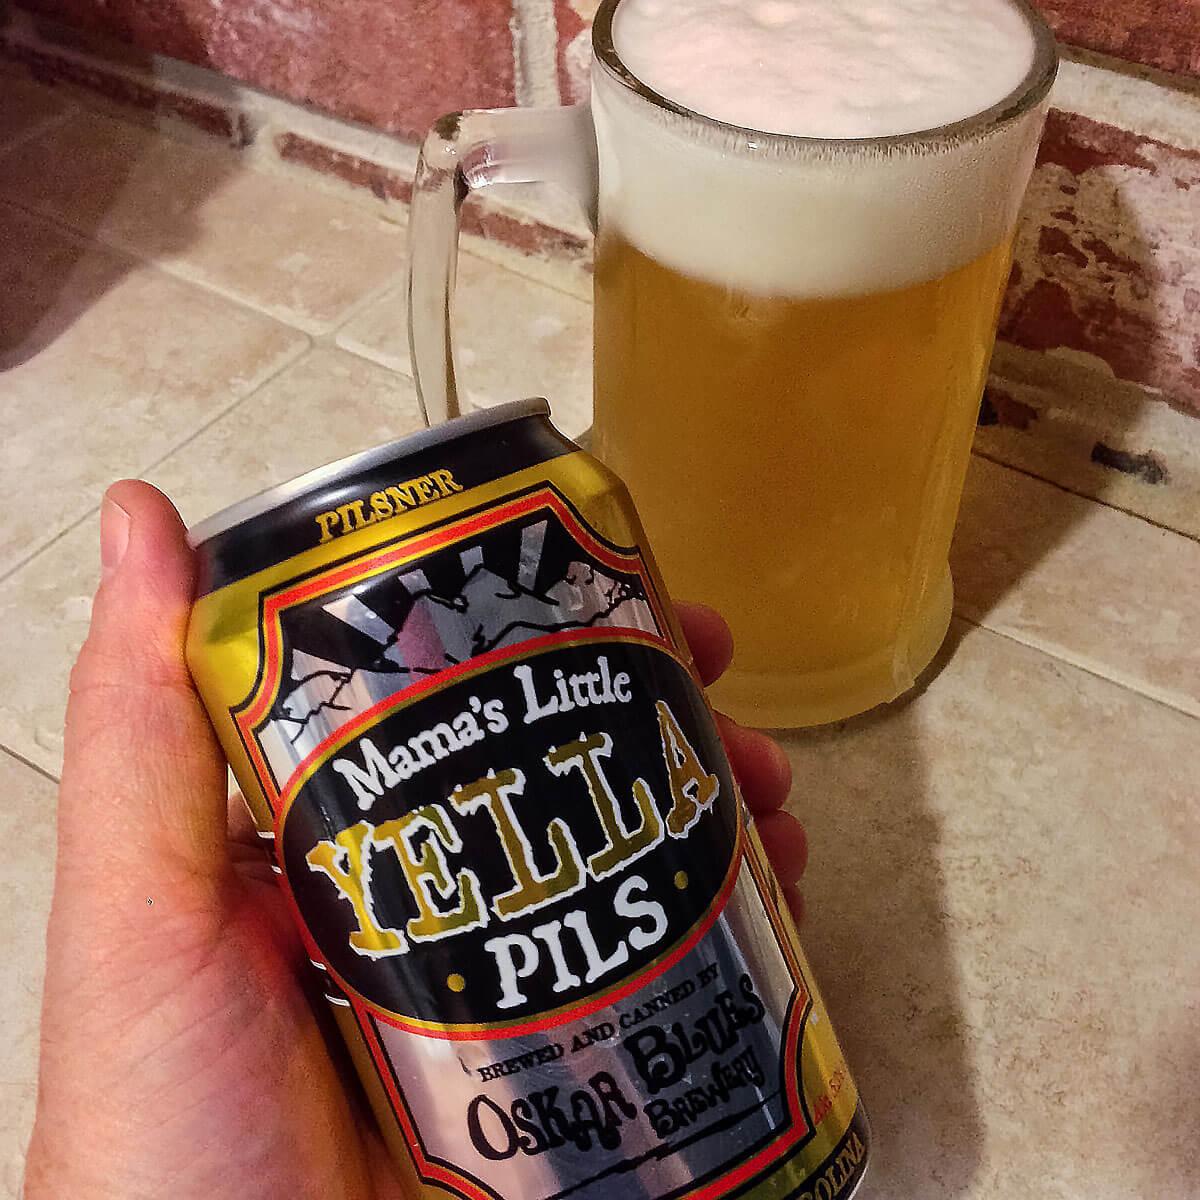 Mama's Little Yella Pils, a Czech-style Pilsener by Oskar Blues Brewery